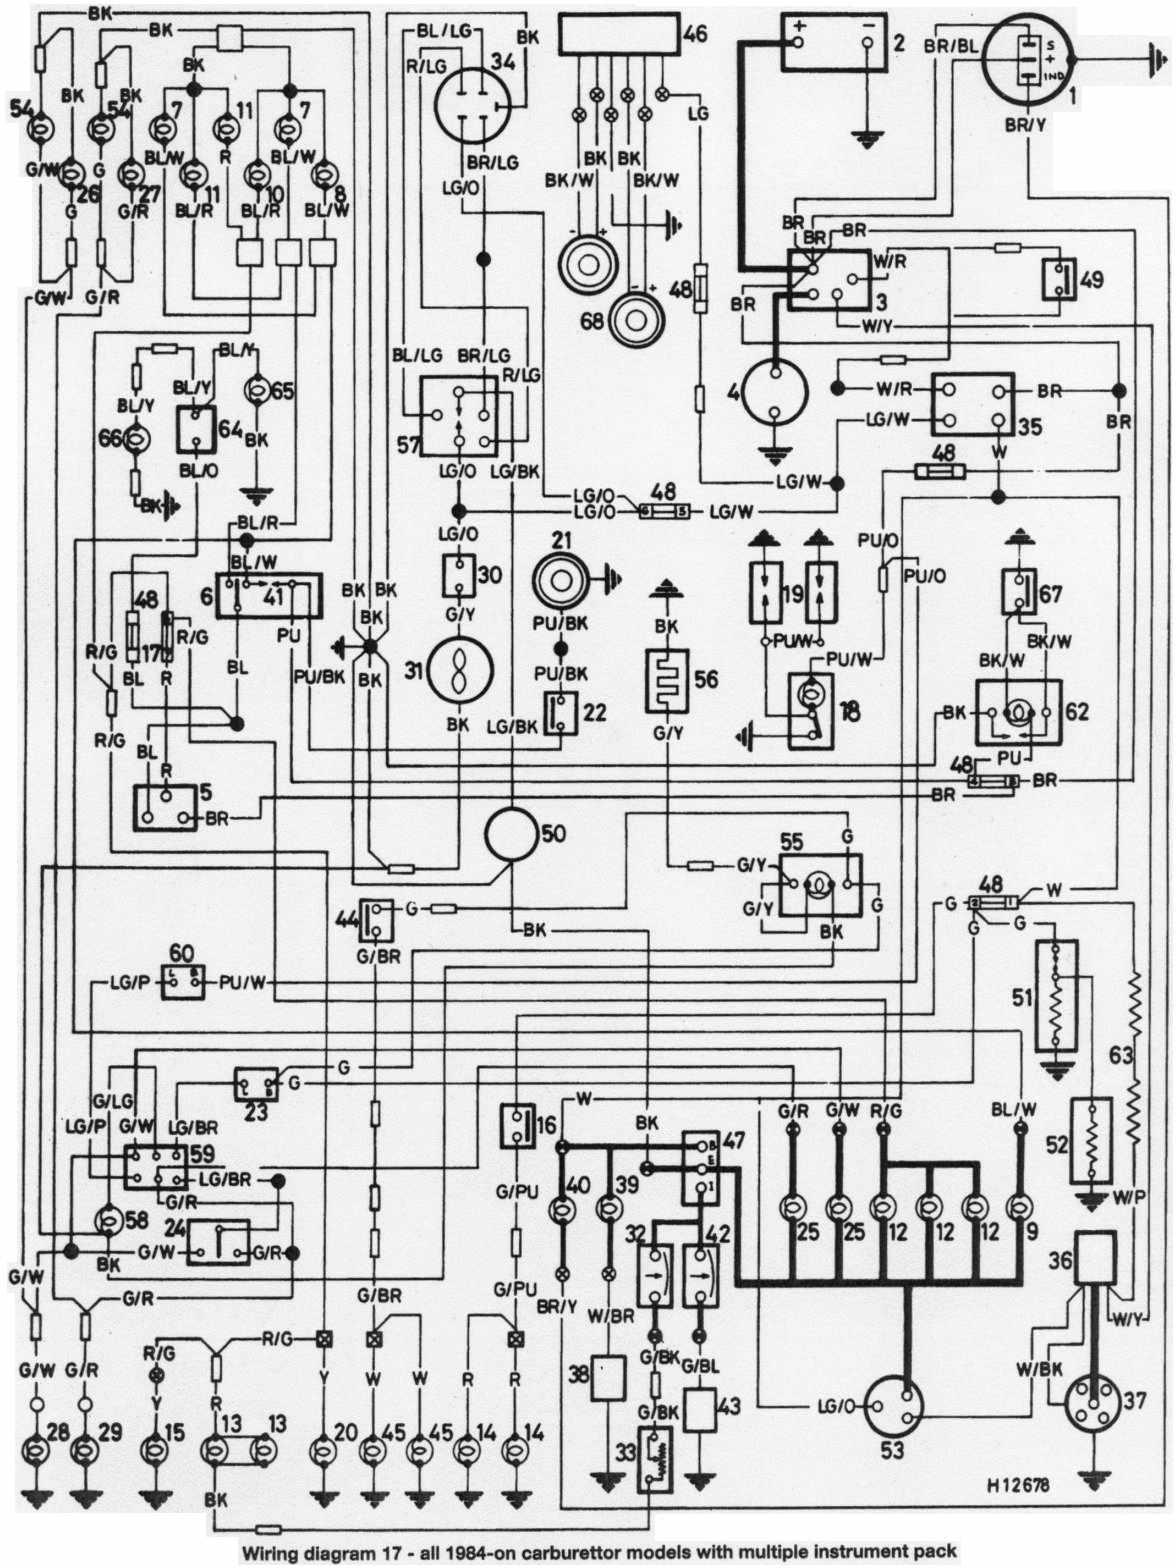 famous caldina wiring diagram ideas - electrical circuit diagram, Wiring diagram